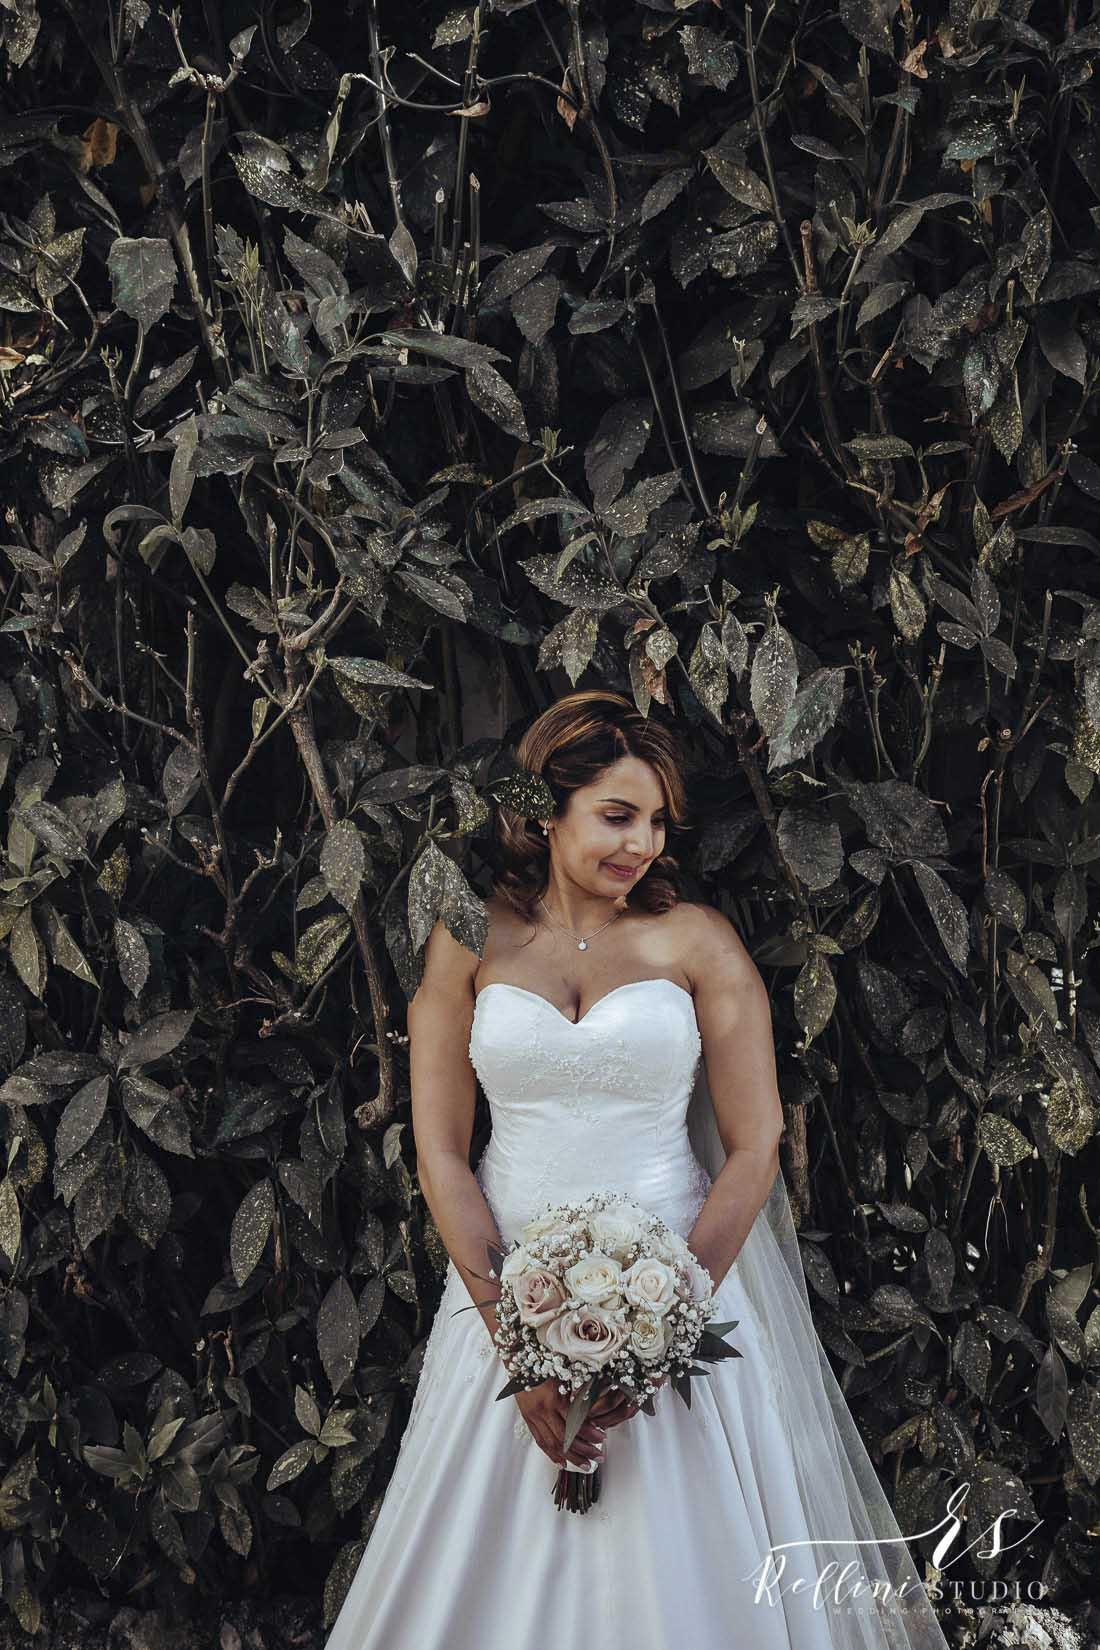 Wedding at Villa Cipressi on the Como Lake, Rellini art studio destination wedding photographers